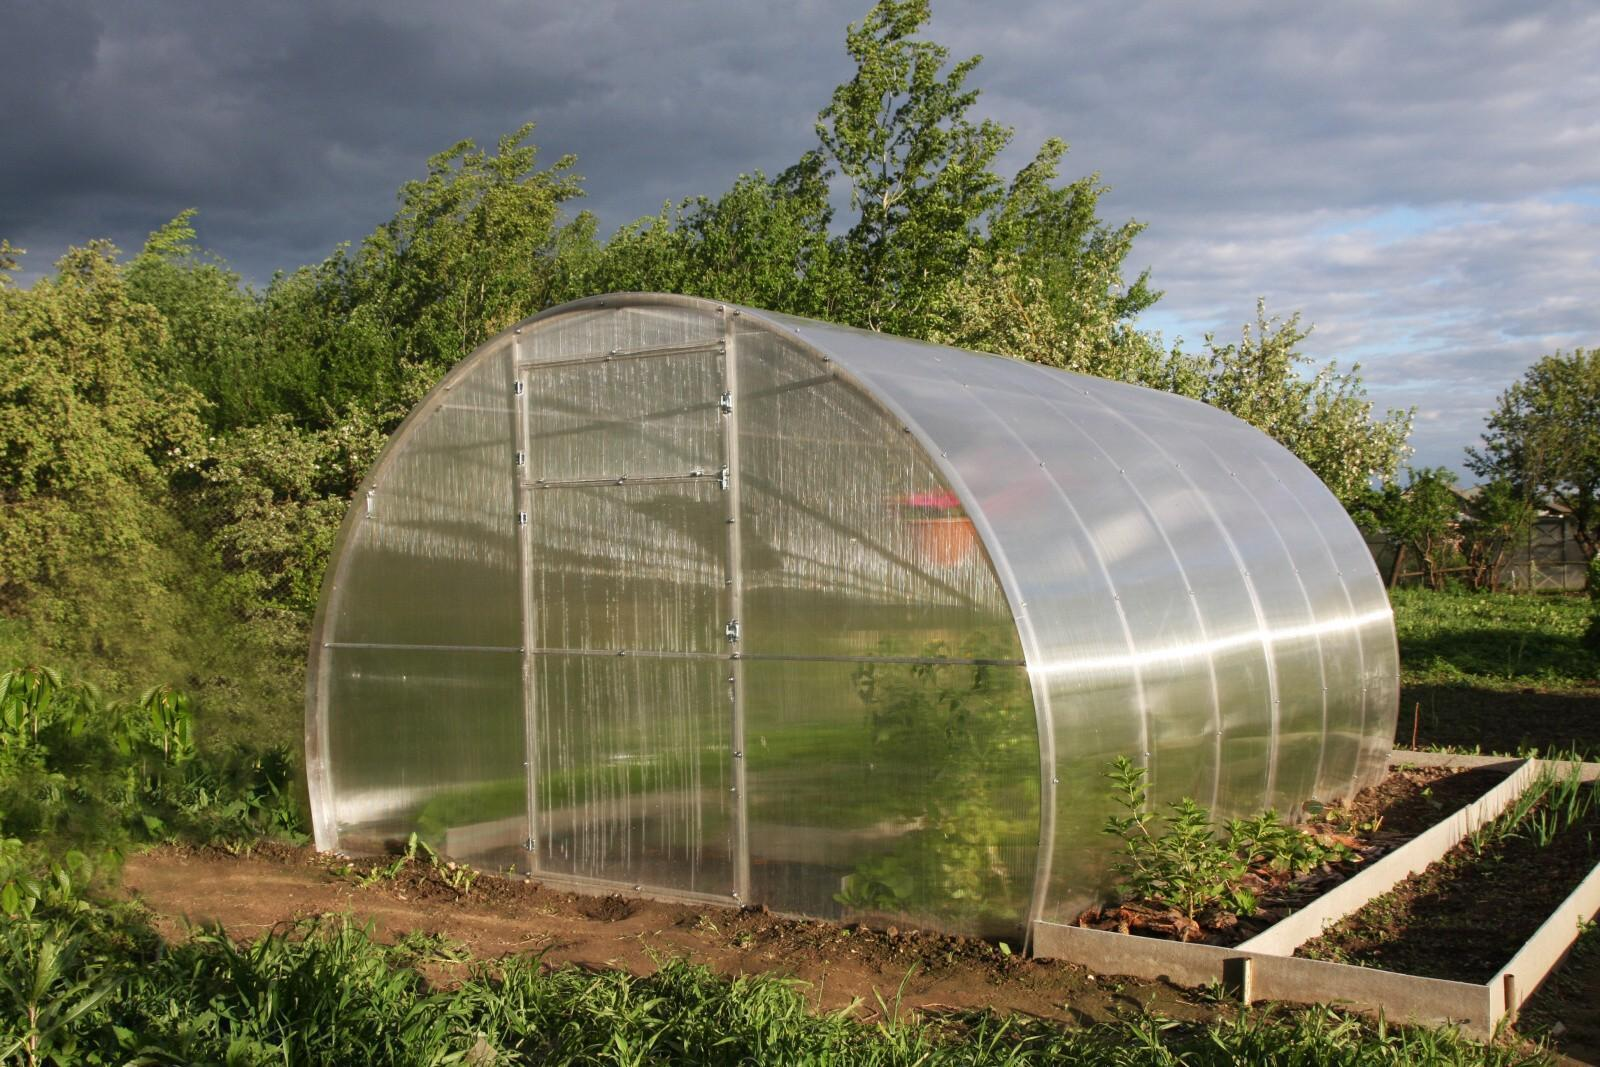 skleník LANITPLAST DNĚPR 3,14x8 m PC 8 mm